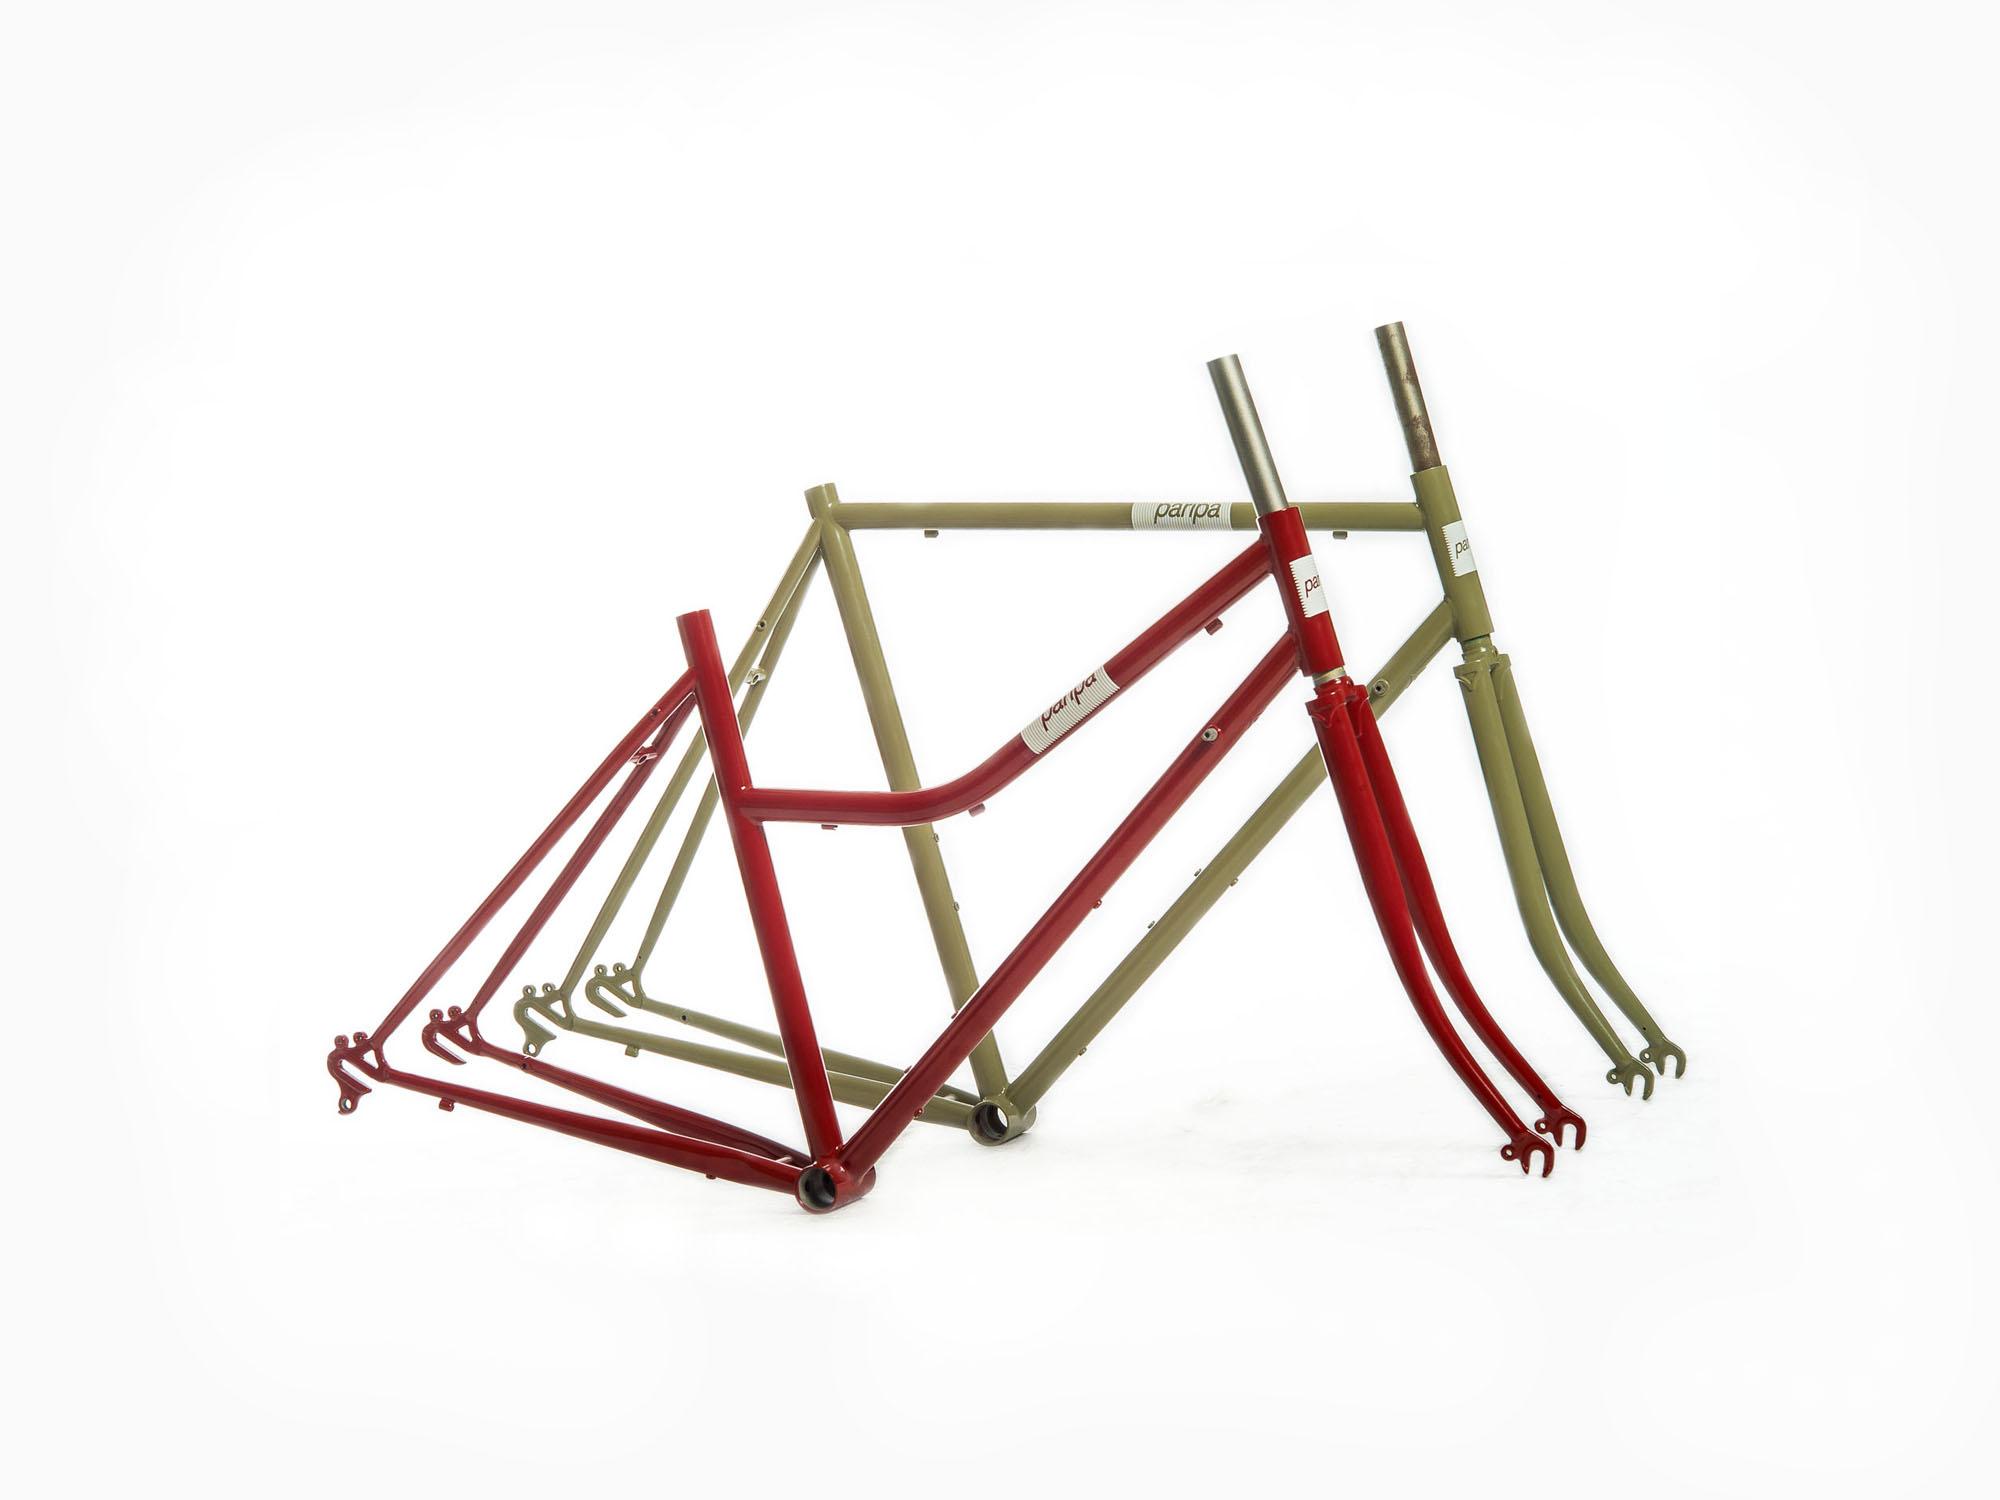 Fahrradrahmen Paripa Sport – Radspannerei